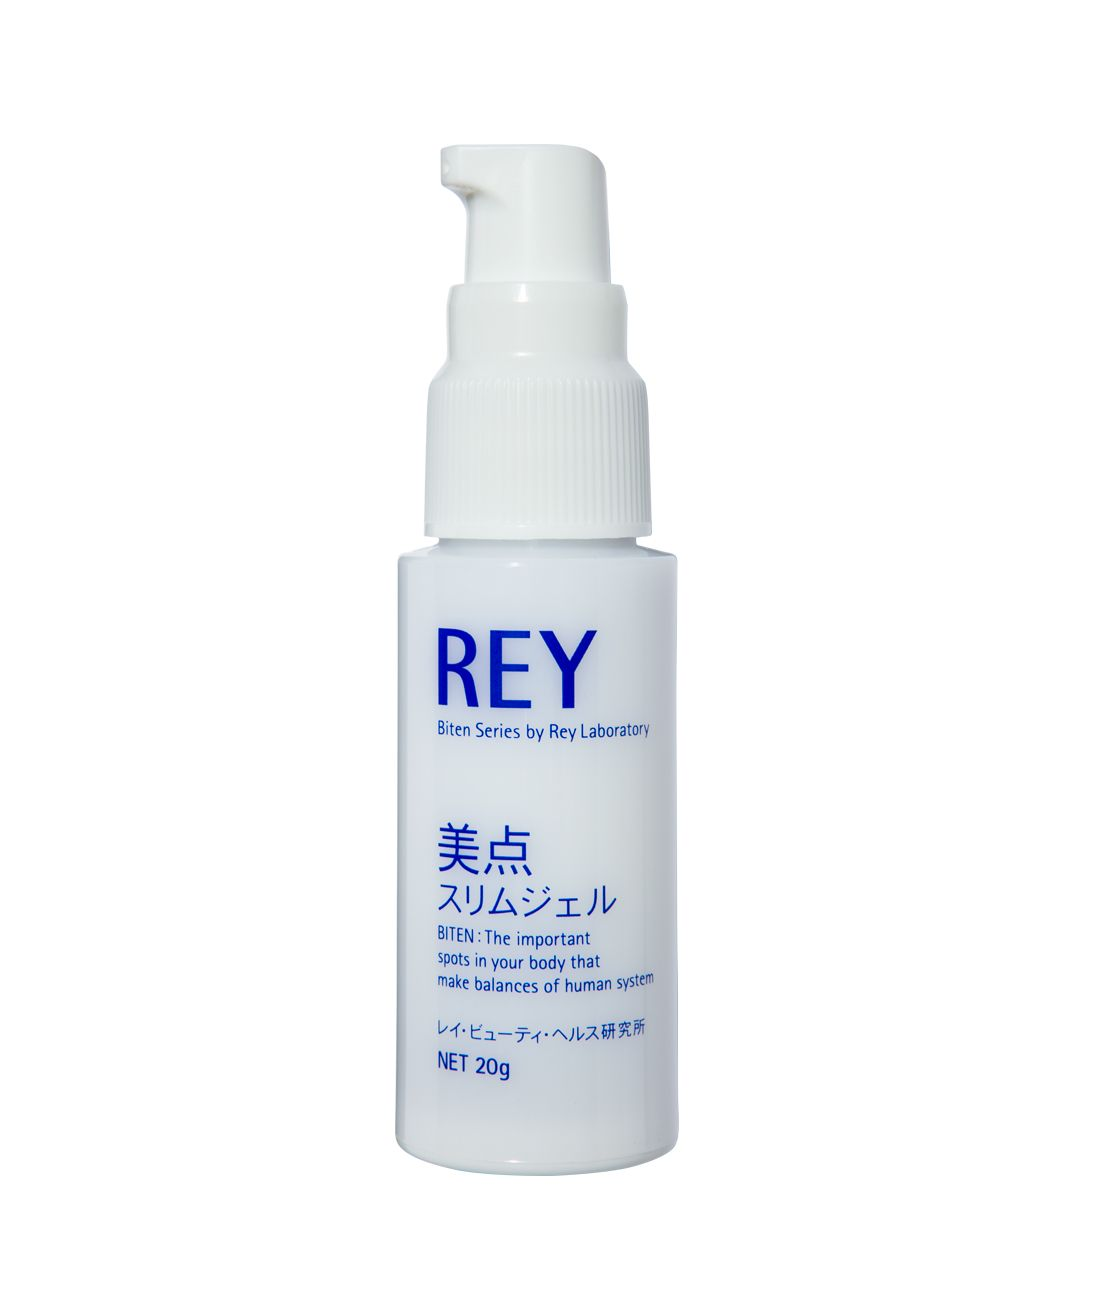 The beauty gel cream